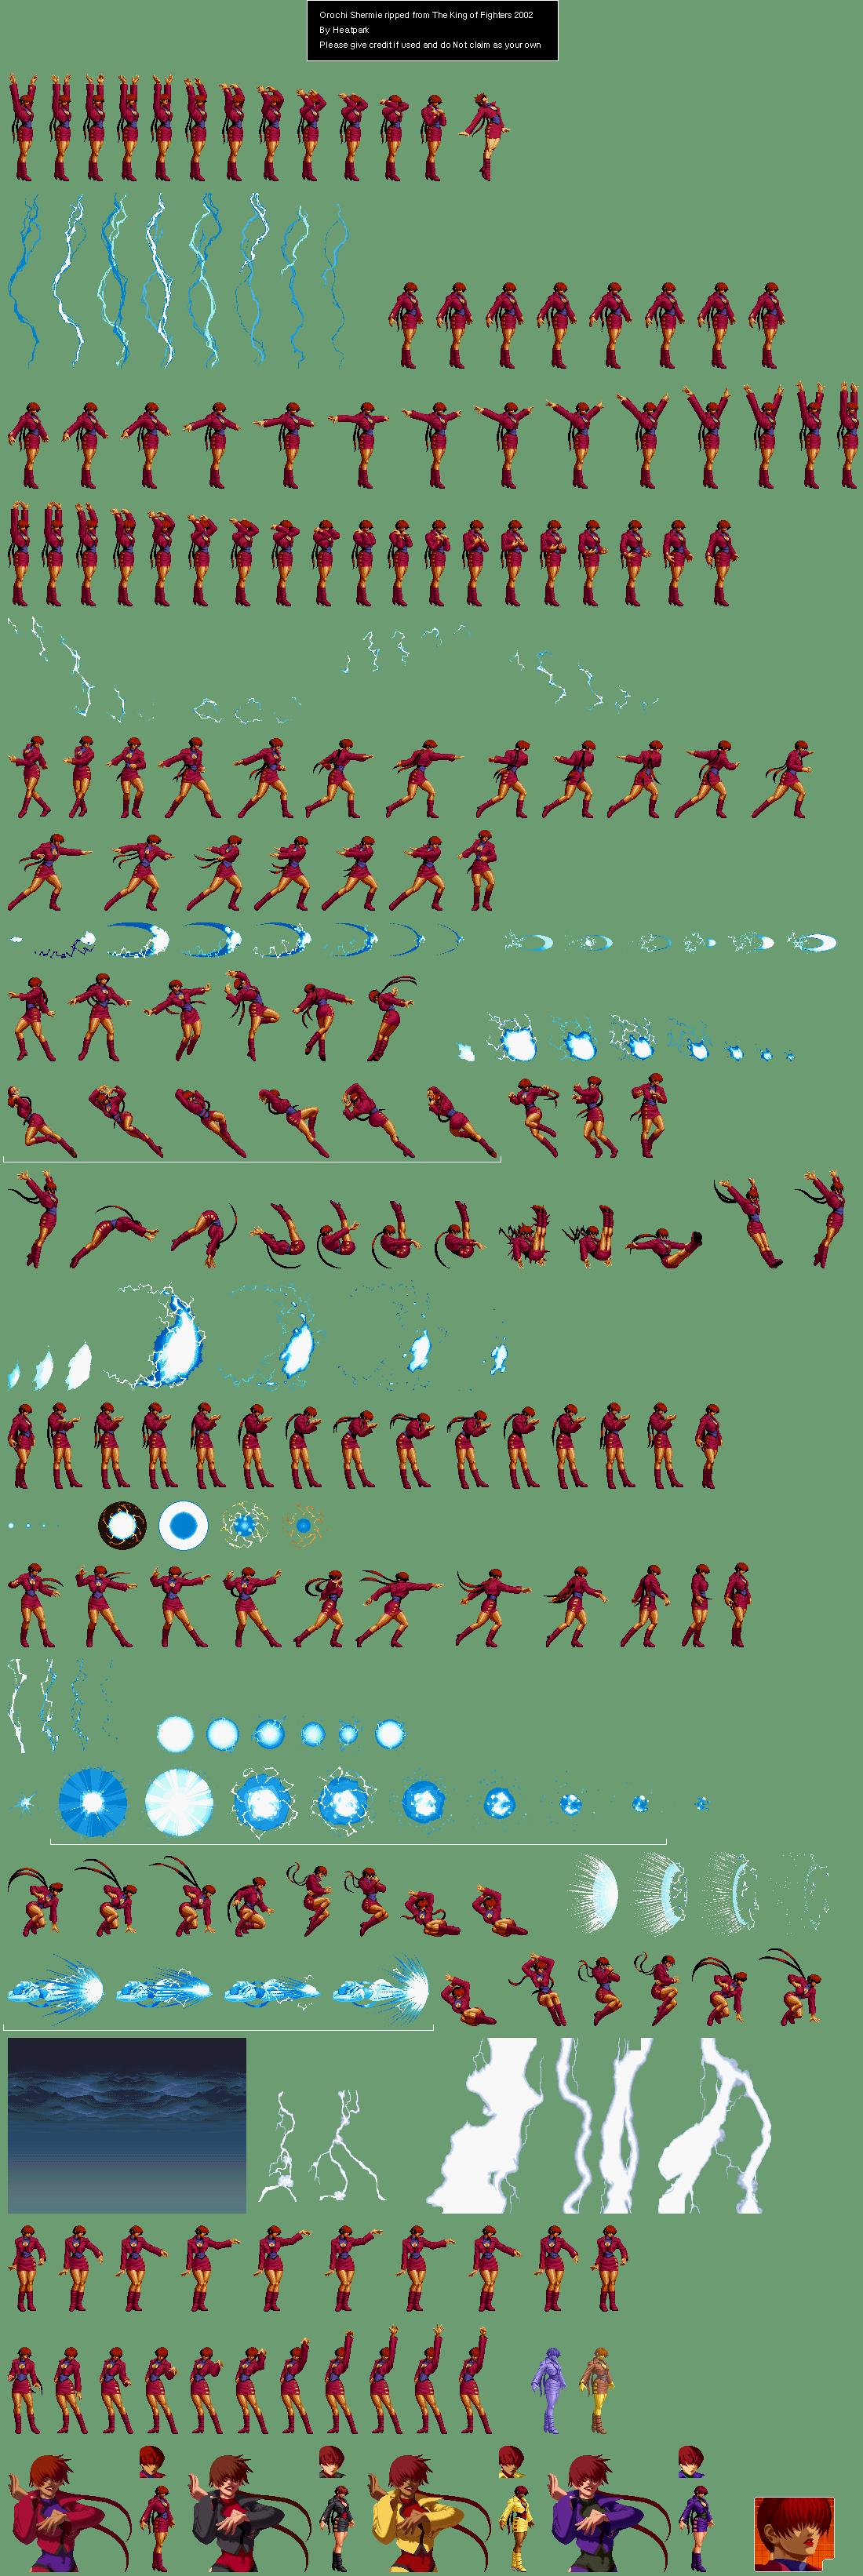 Orochi Shermie - Sprite Database